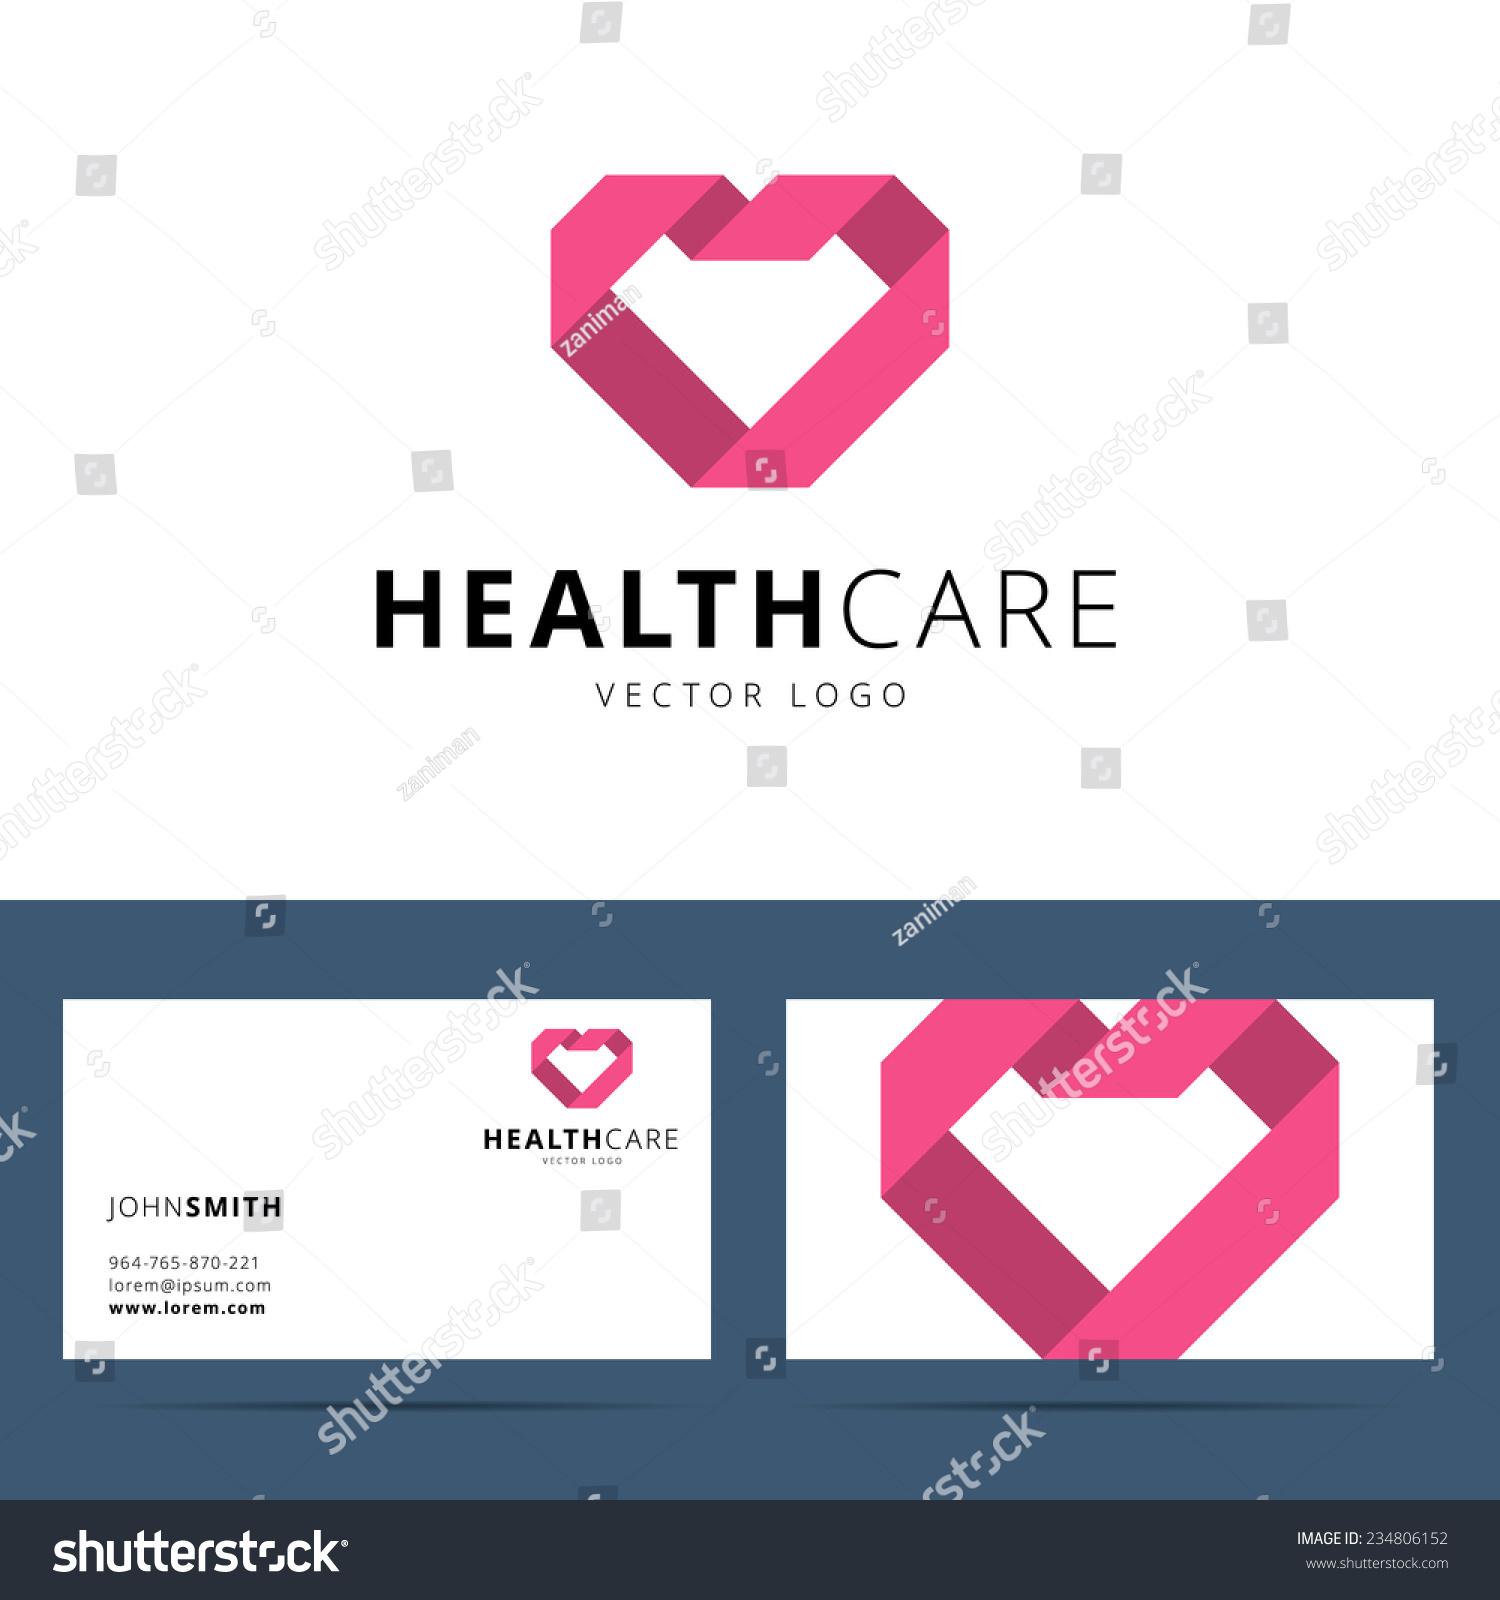 health care vector logo business card stock vector